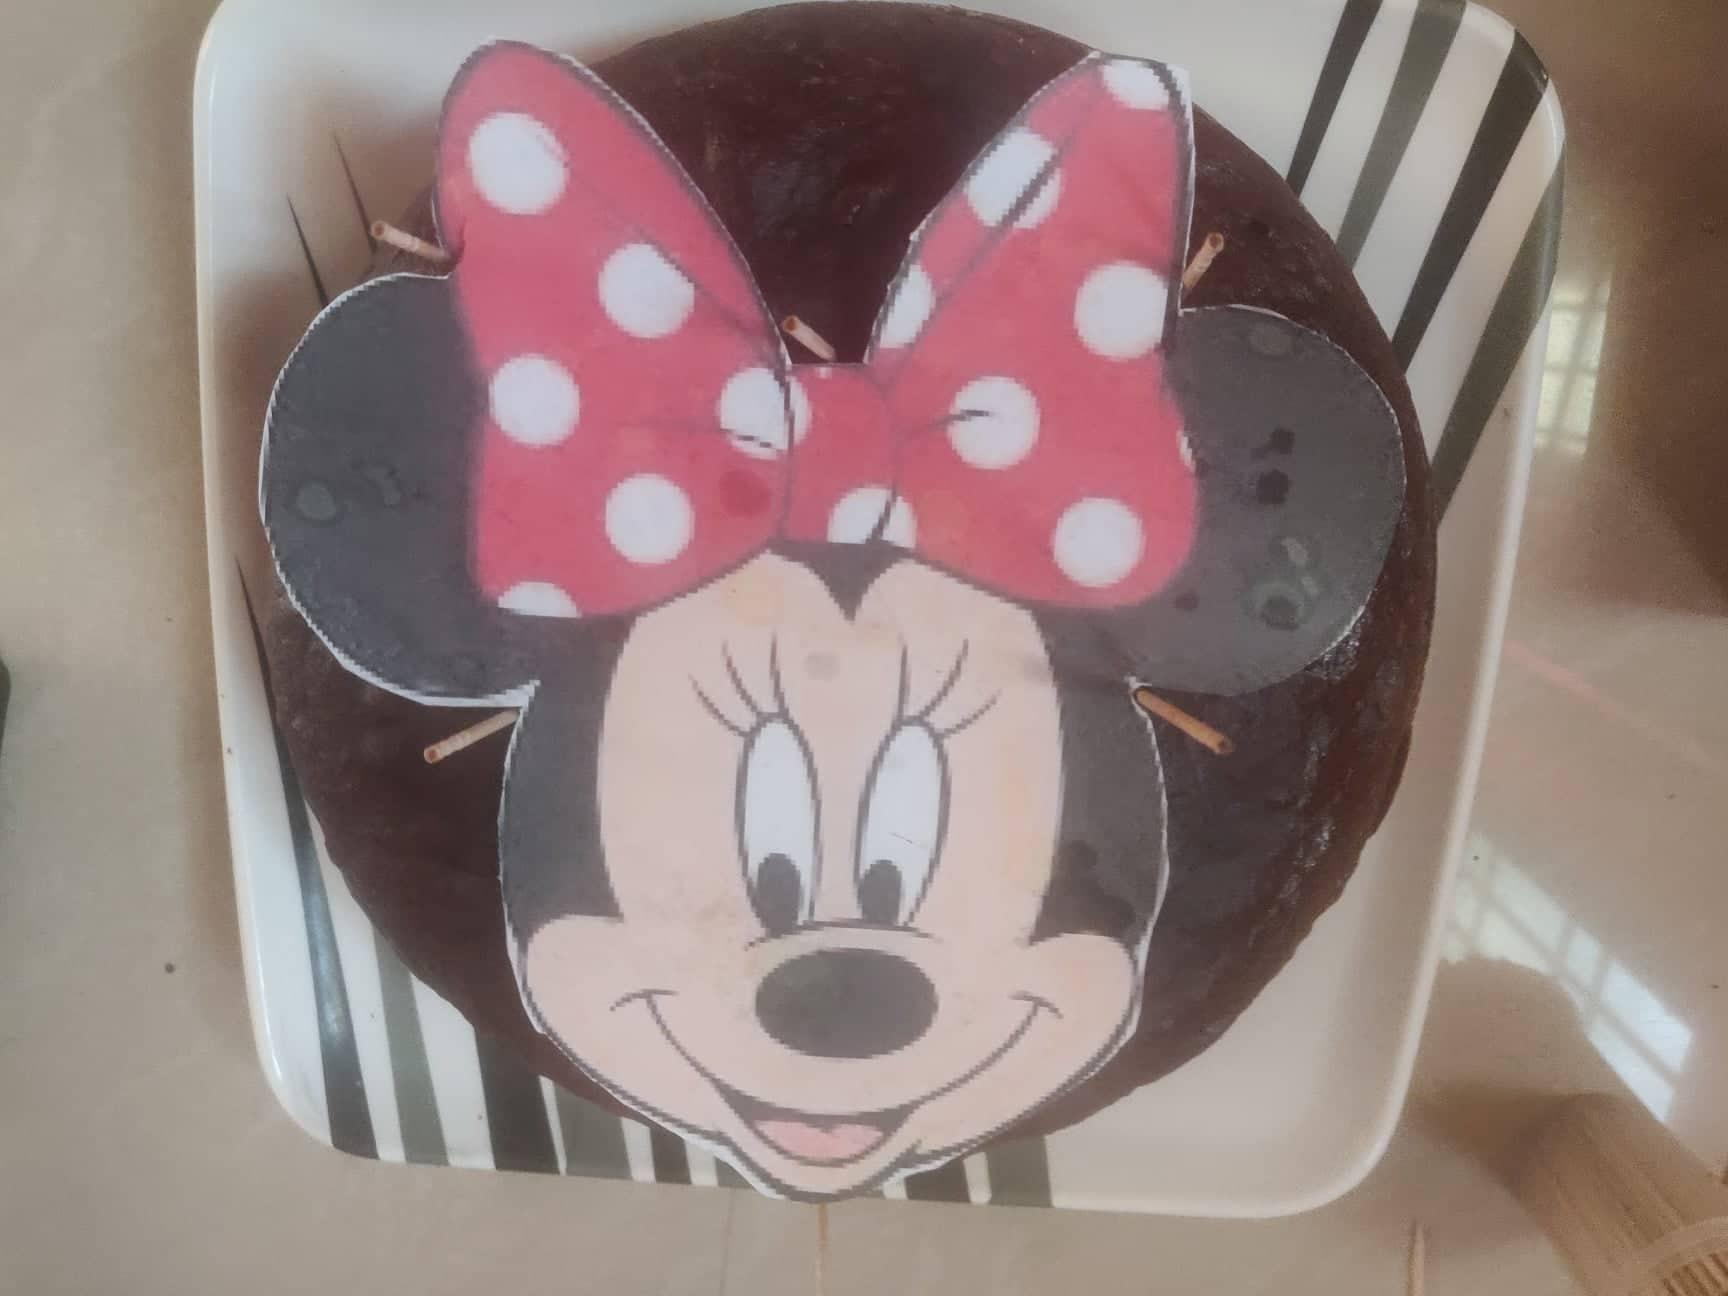 Minnie_Mouse_Cake - 177946948_2881764005394974_4673799725558435830_n